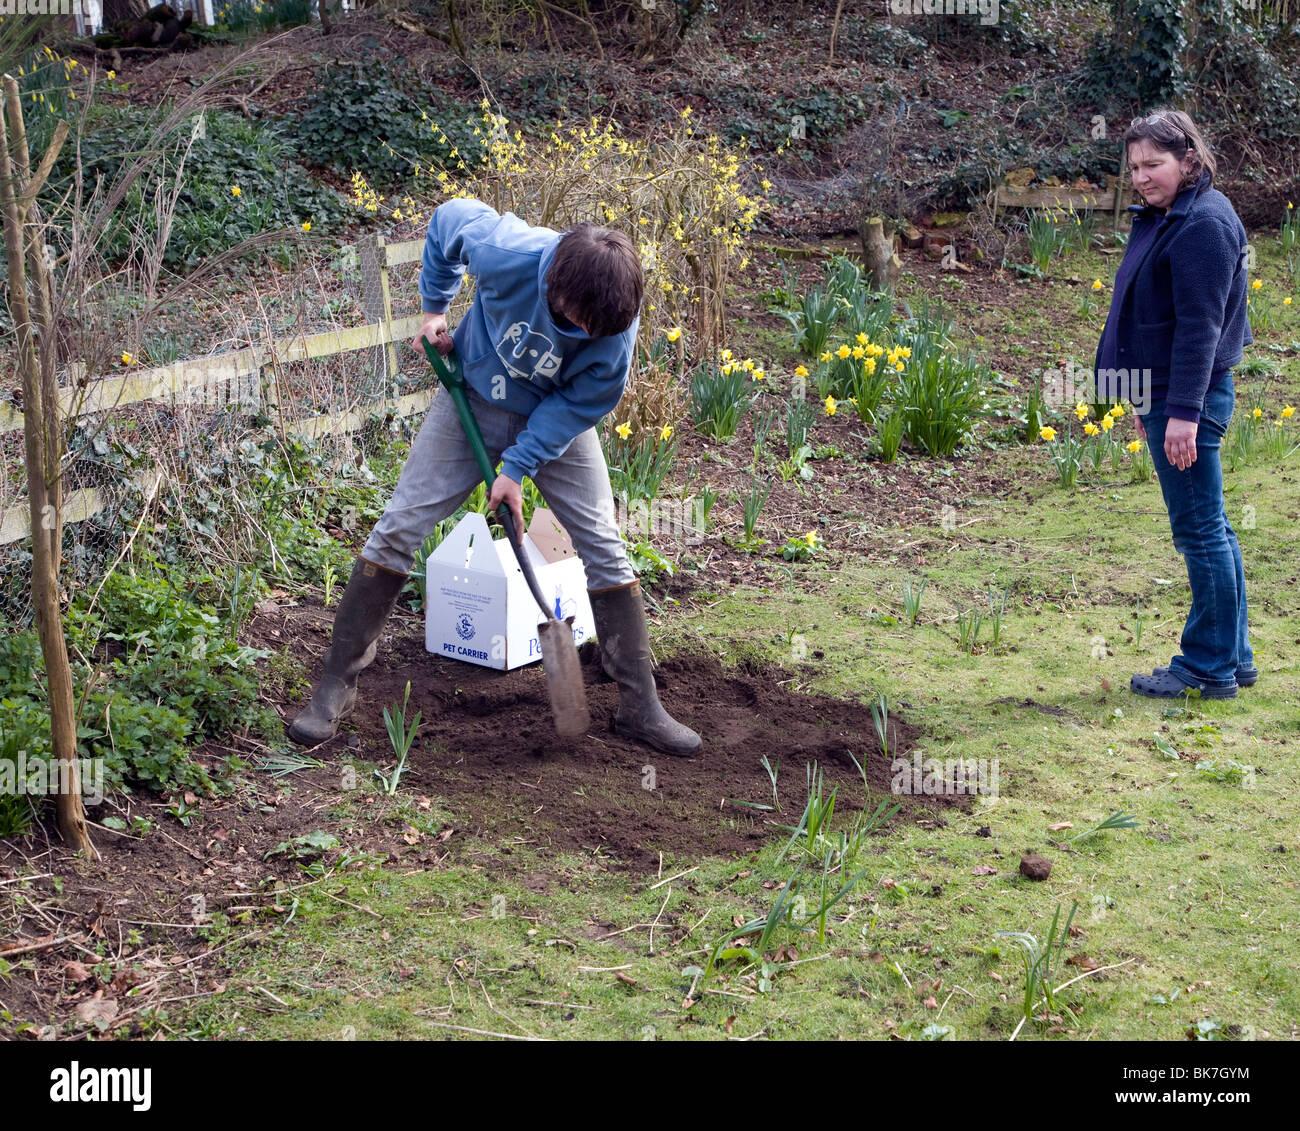 Model released teenage boy digging hole in garden to bury pet cat Stock Photo